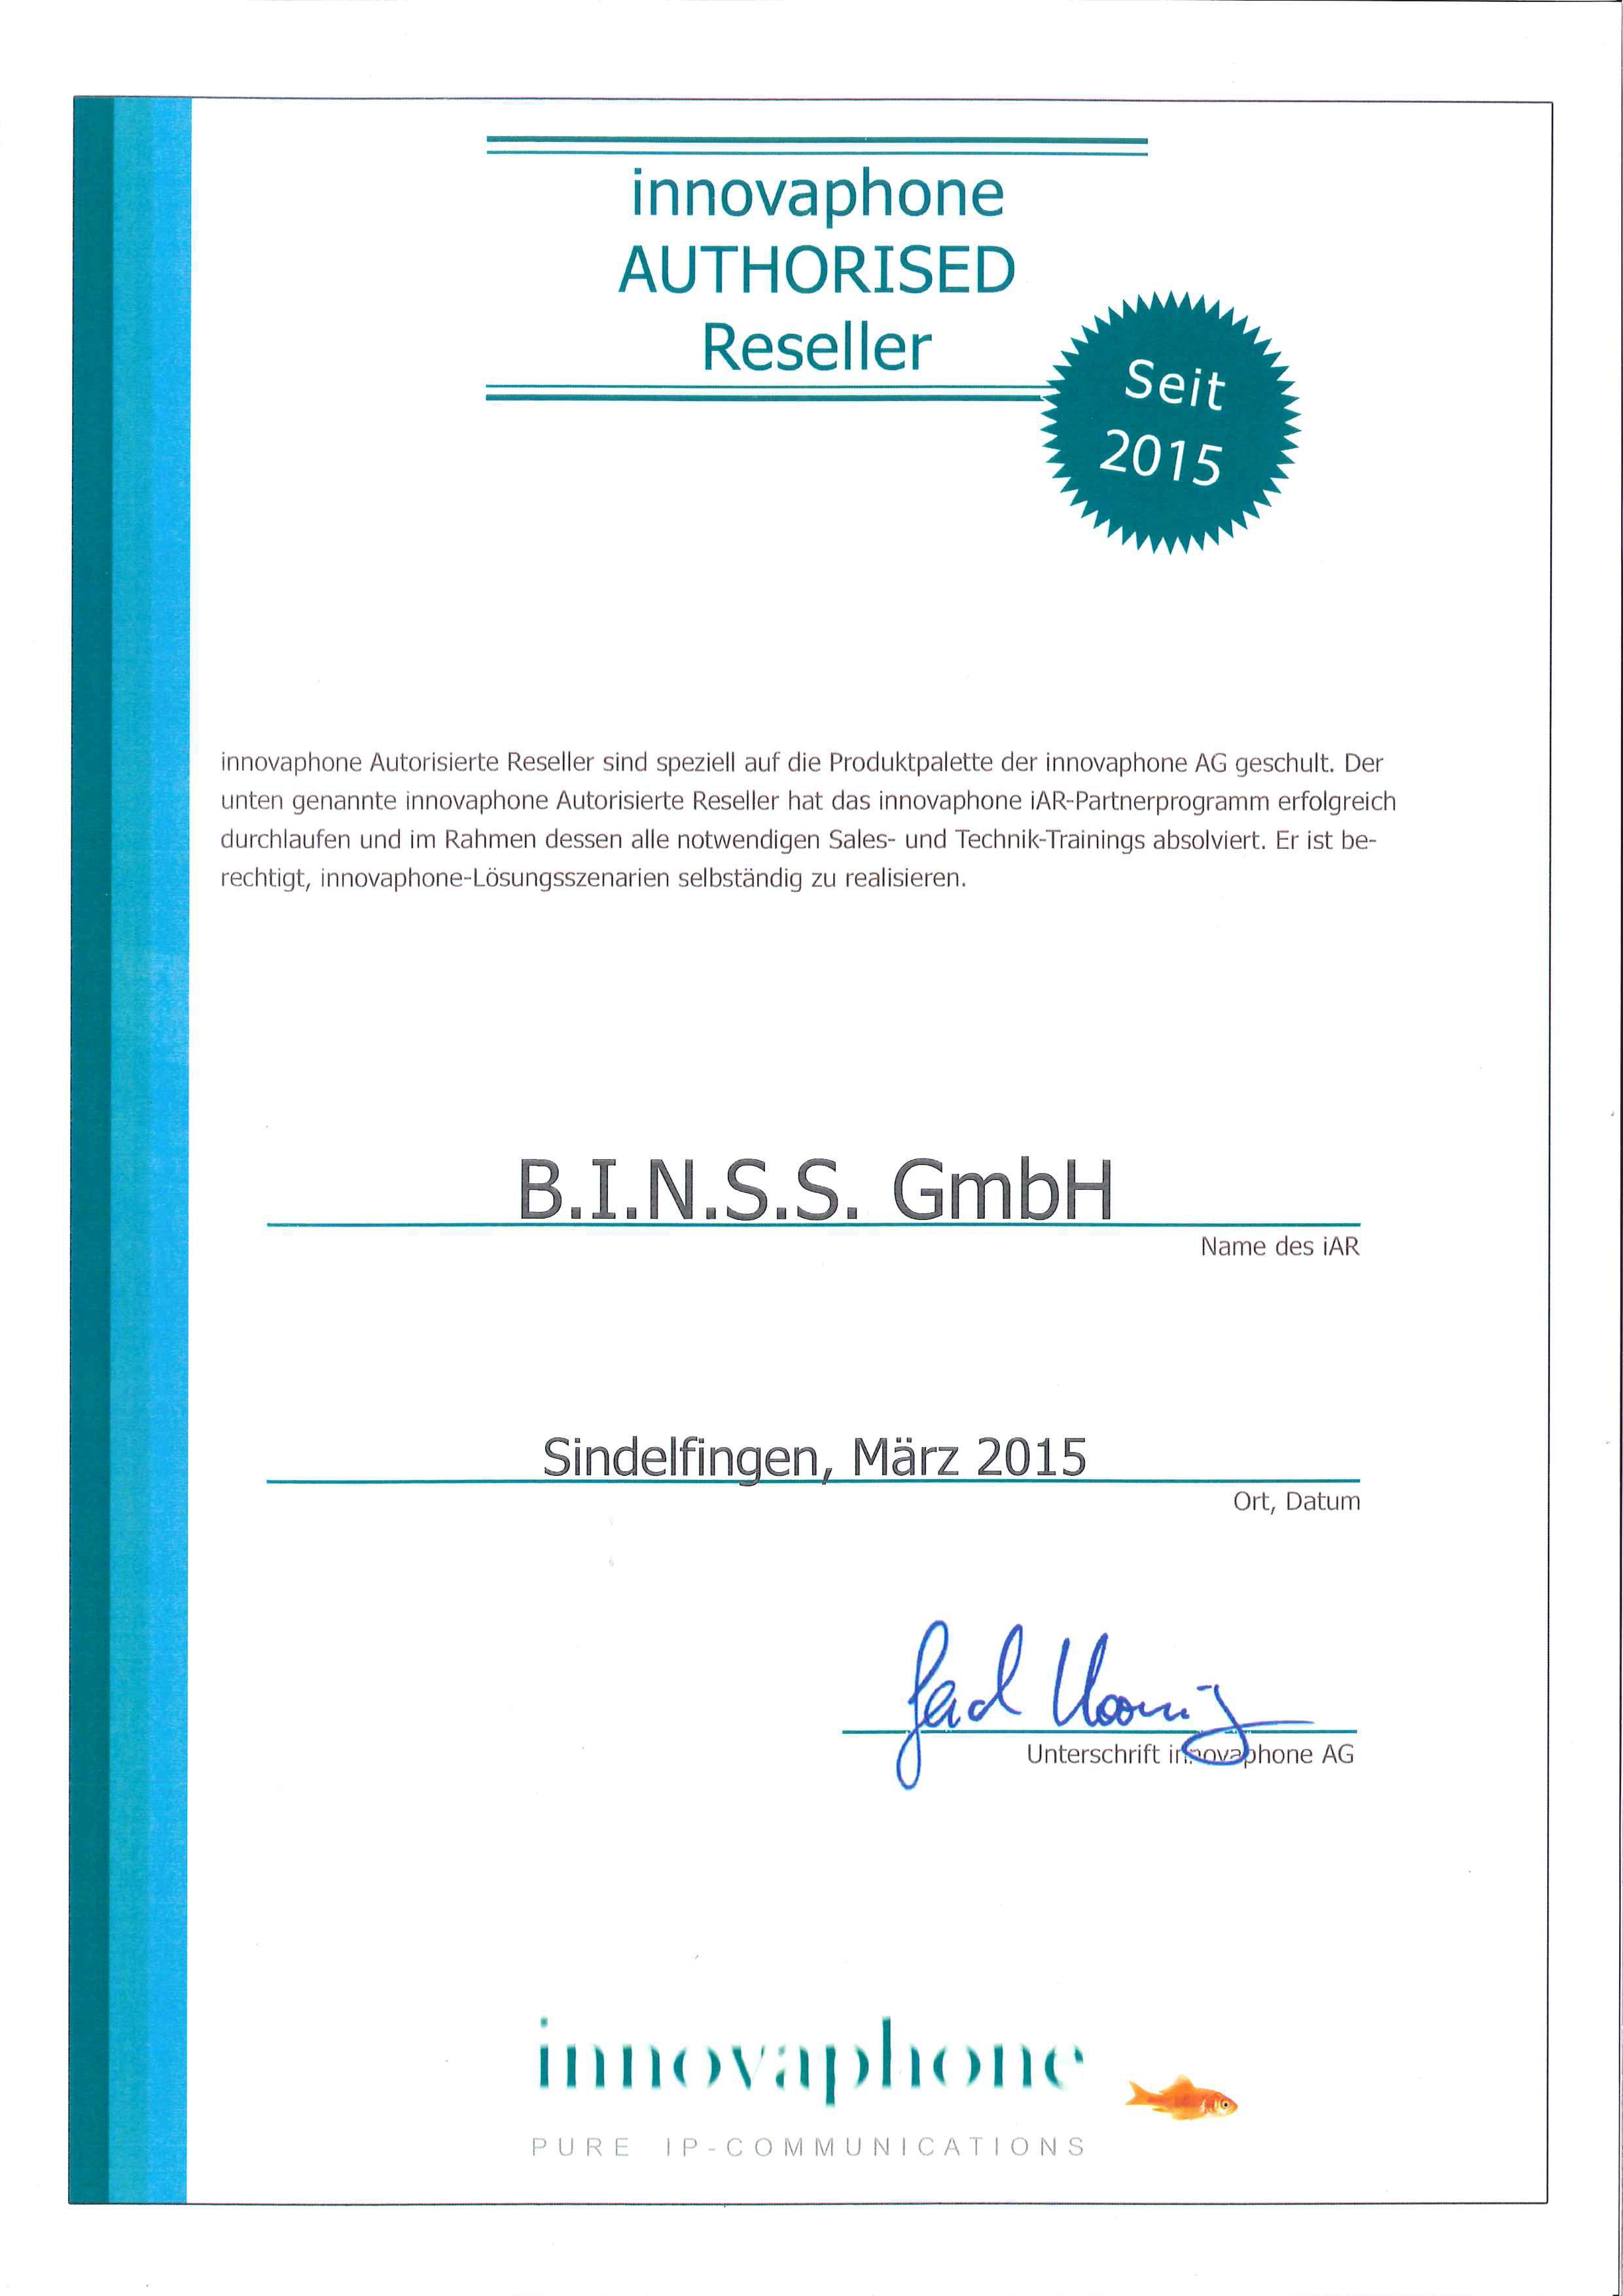 zertifikat-innovaphone-authorised-reseller